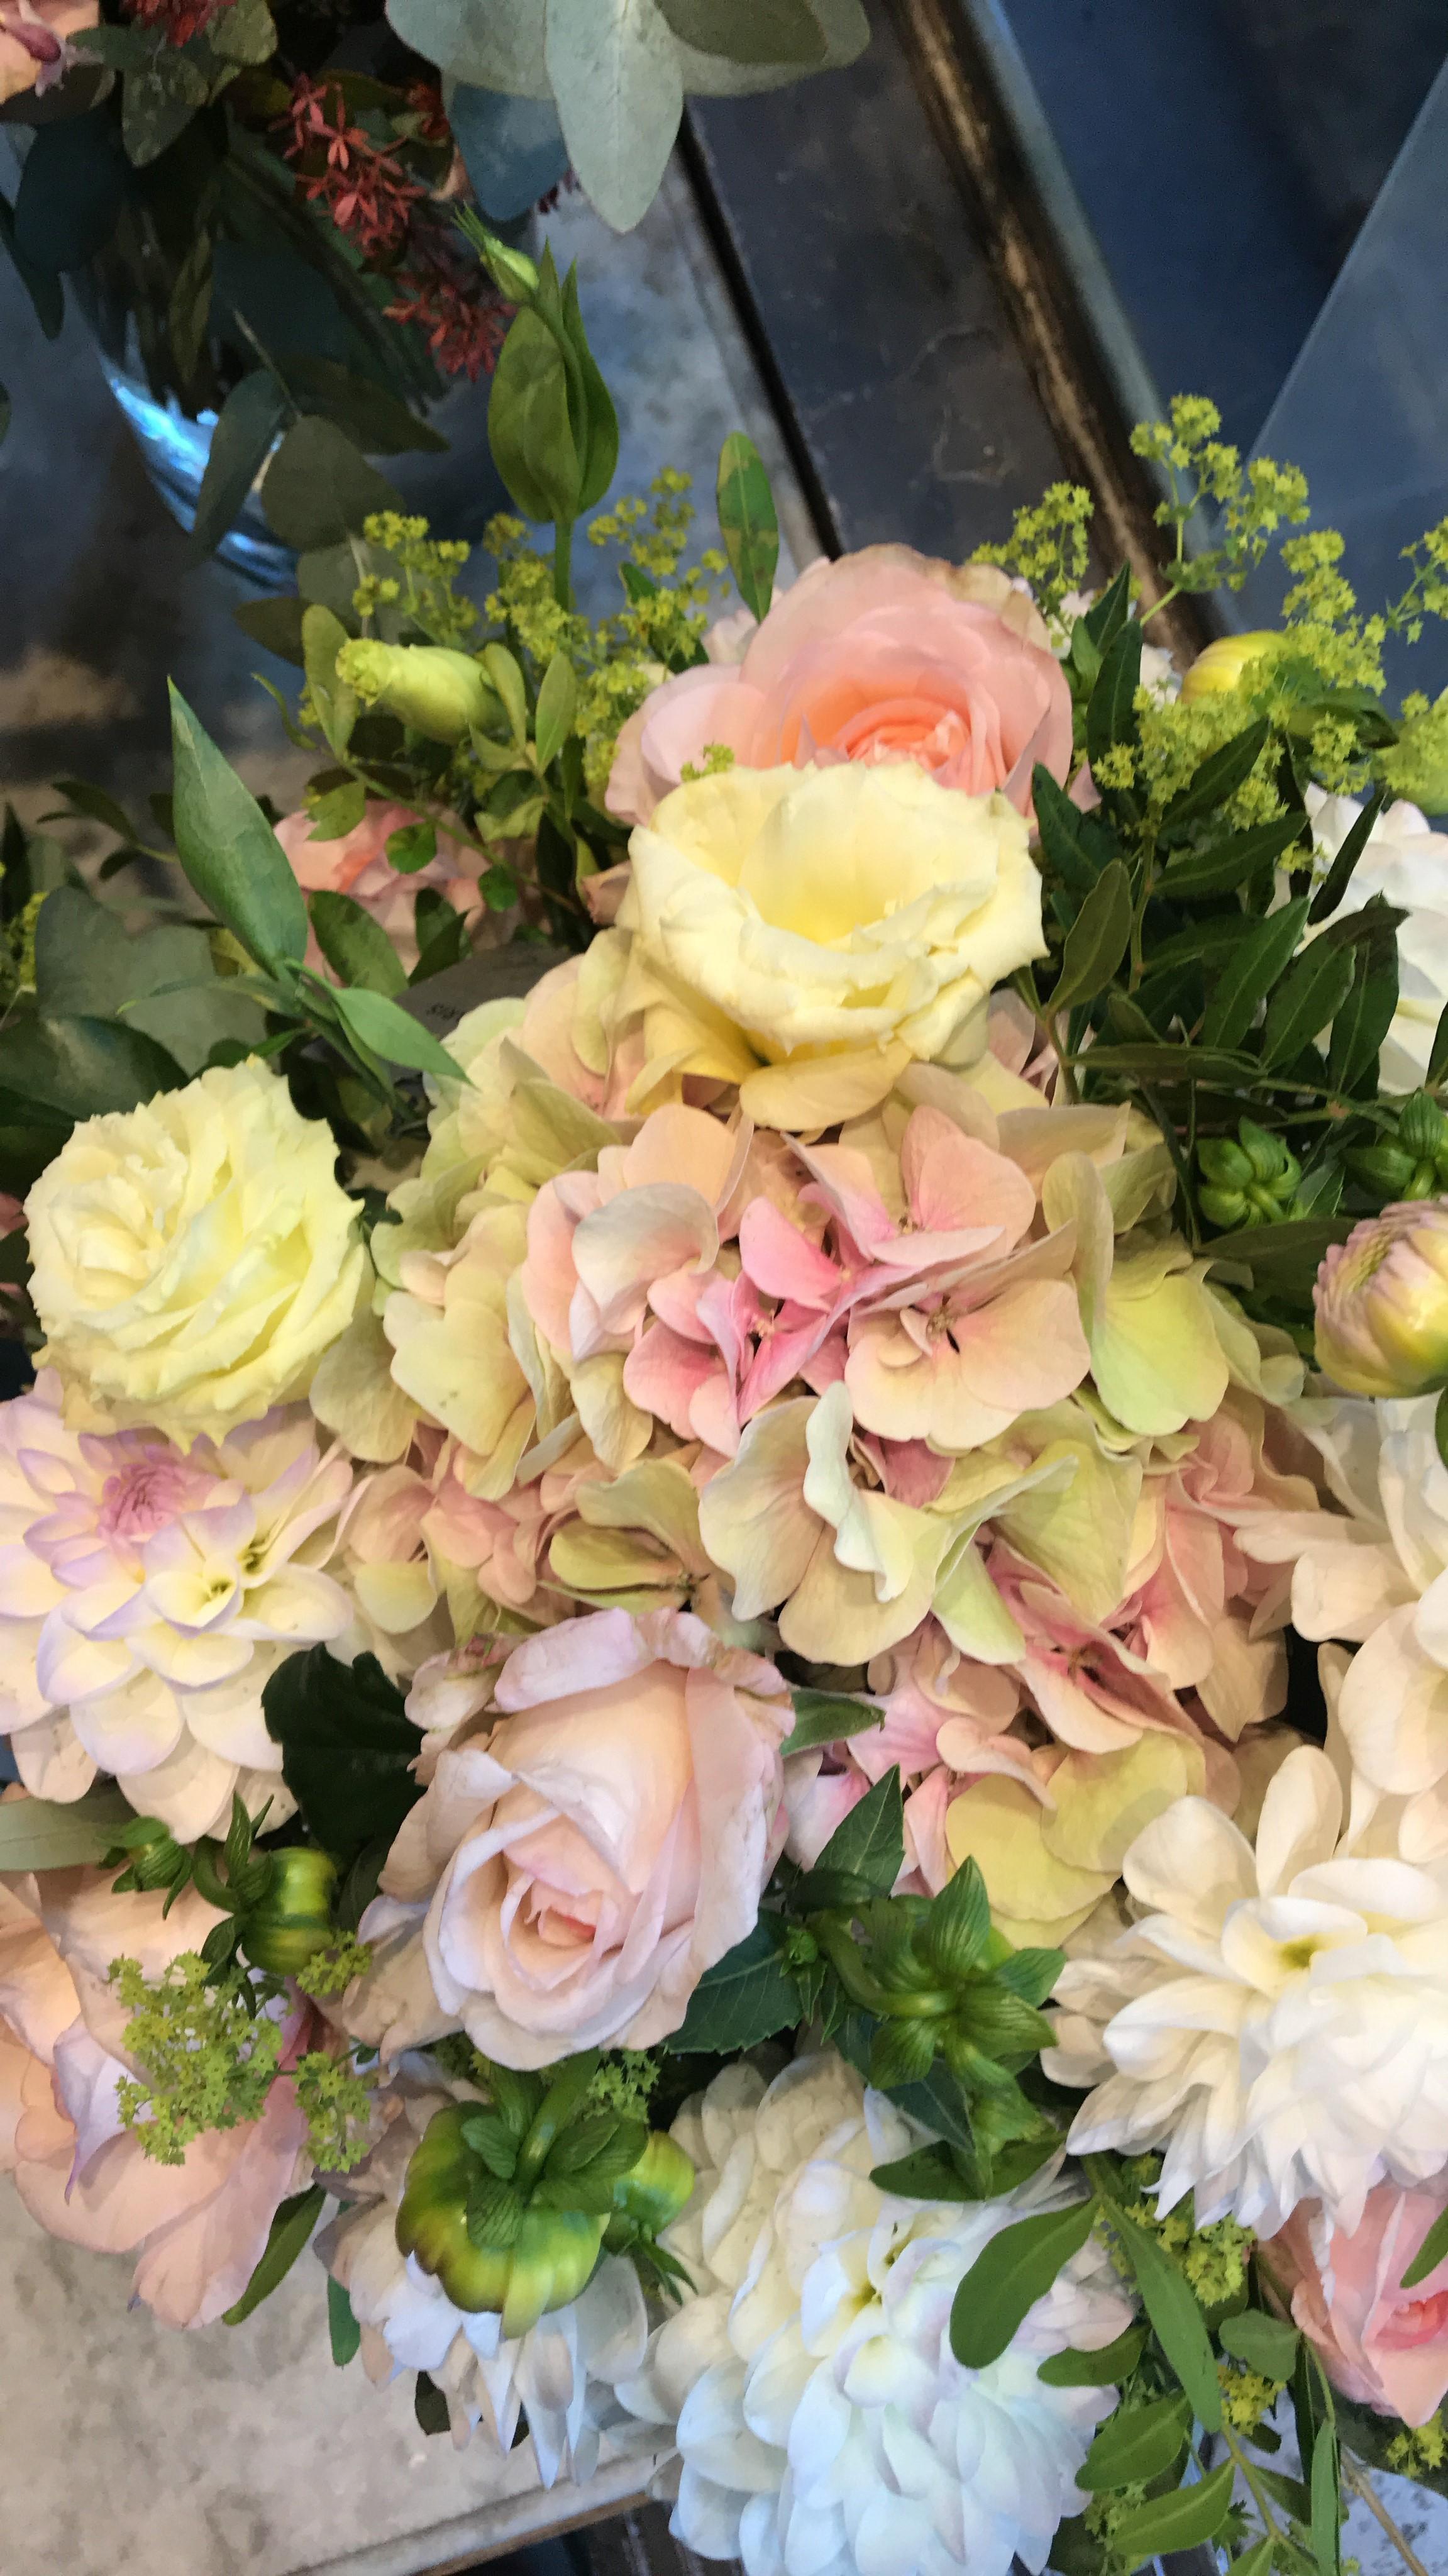 paris-flower-shop-yellow-roses.jpg